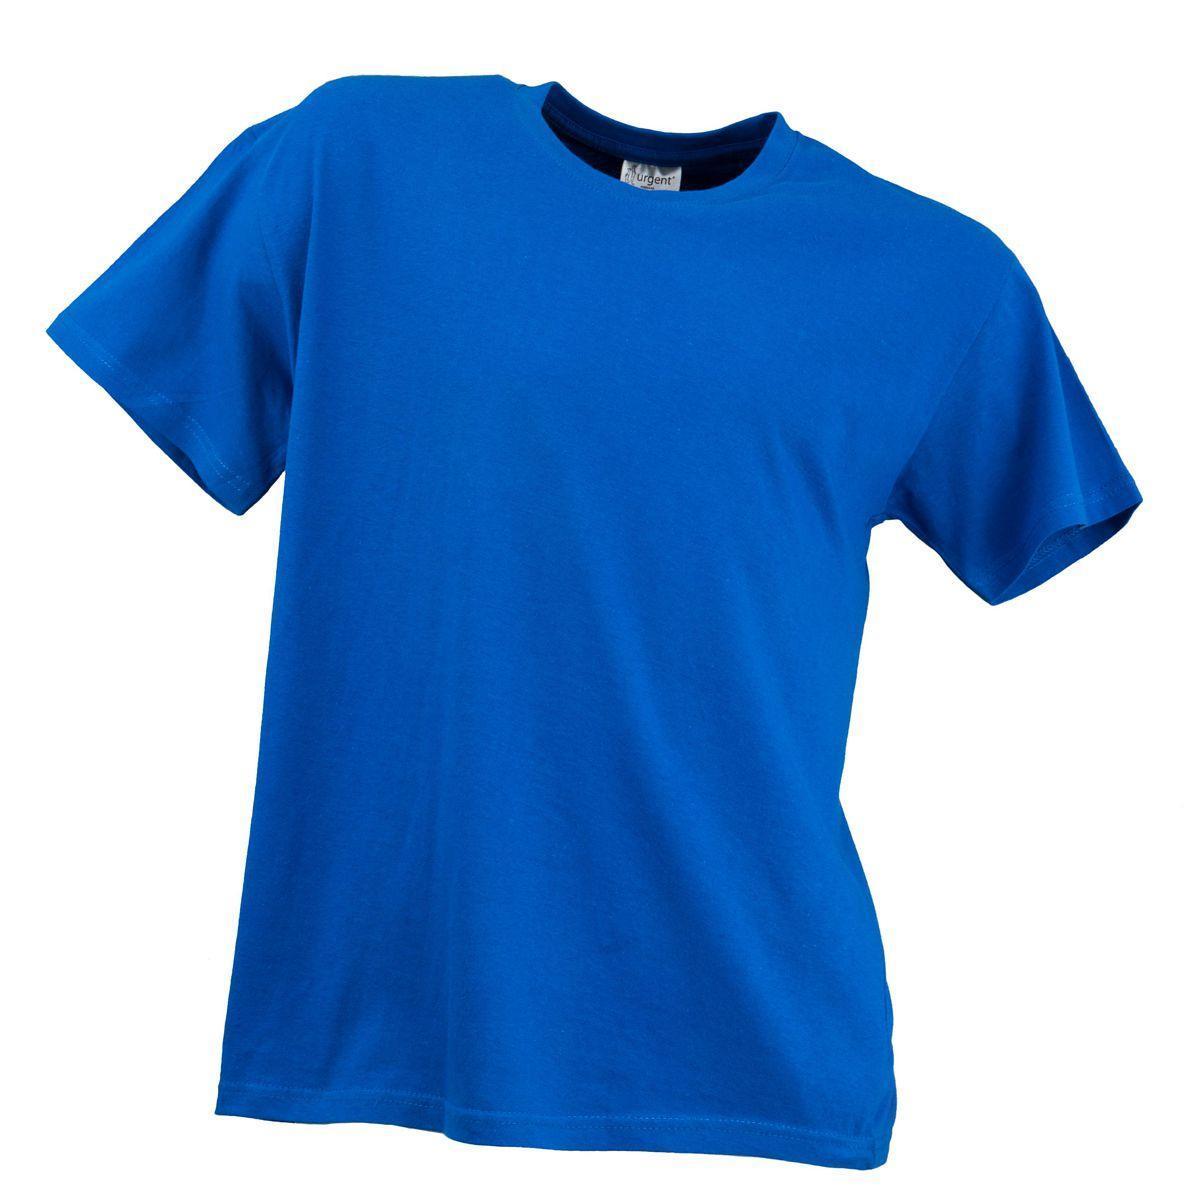 Футболка T-SHIRT MĘSKI POMARAŃCZ 180g плотностью 180g, синего цвета.  Urgent (POLAND) M